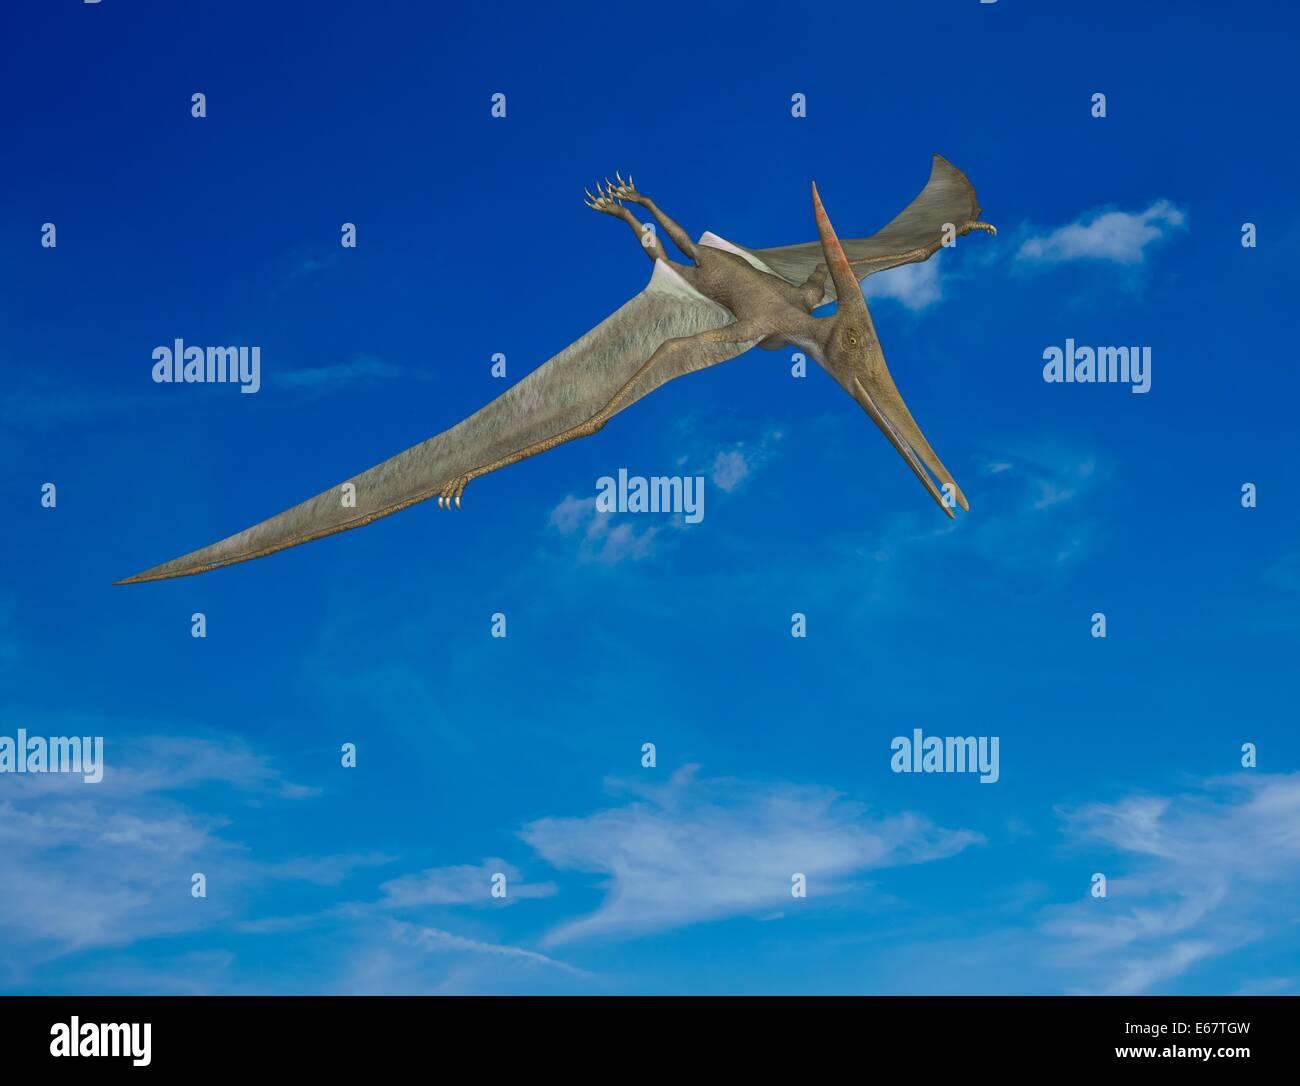 Dinosaurier Pteranodon / dinosaur Pteranodon Stock Photo